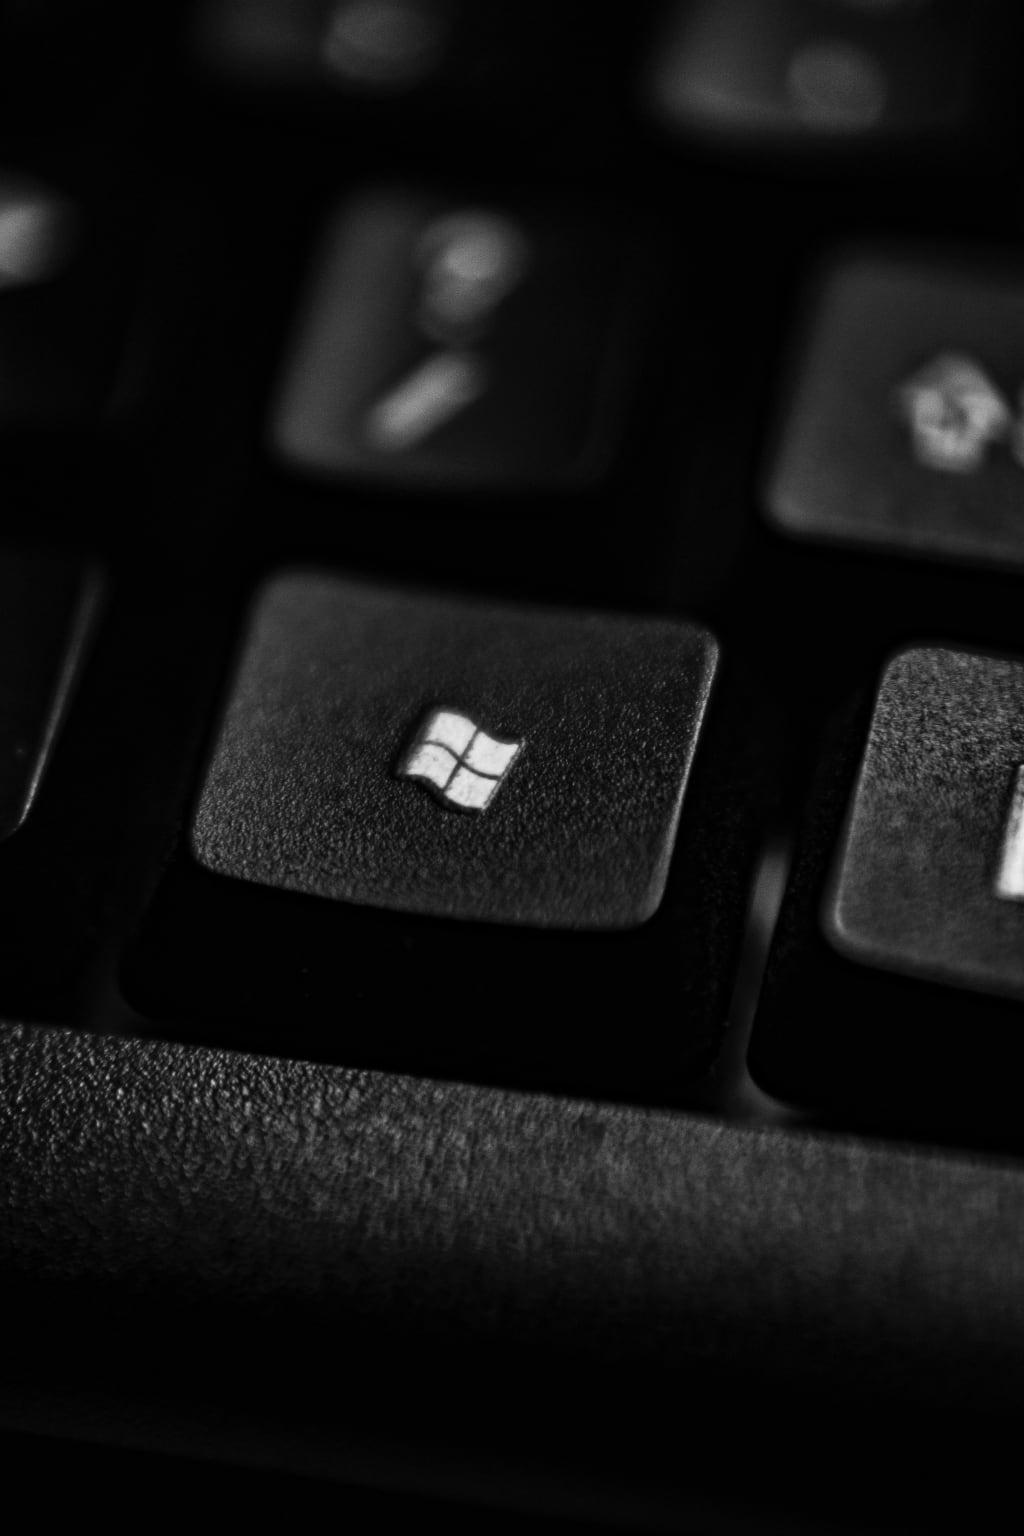 Microsoft: A Case Study